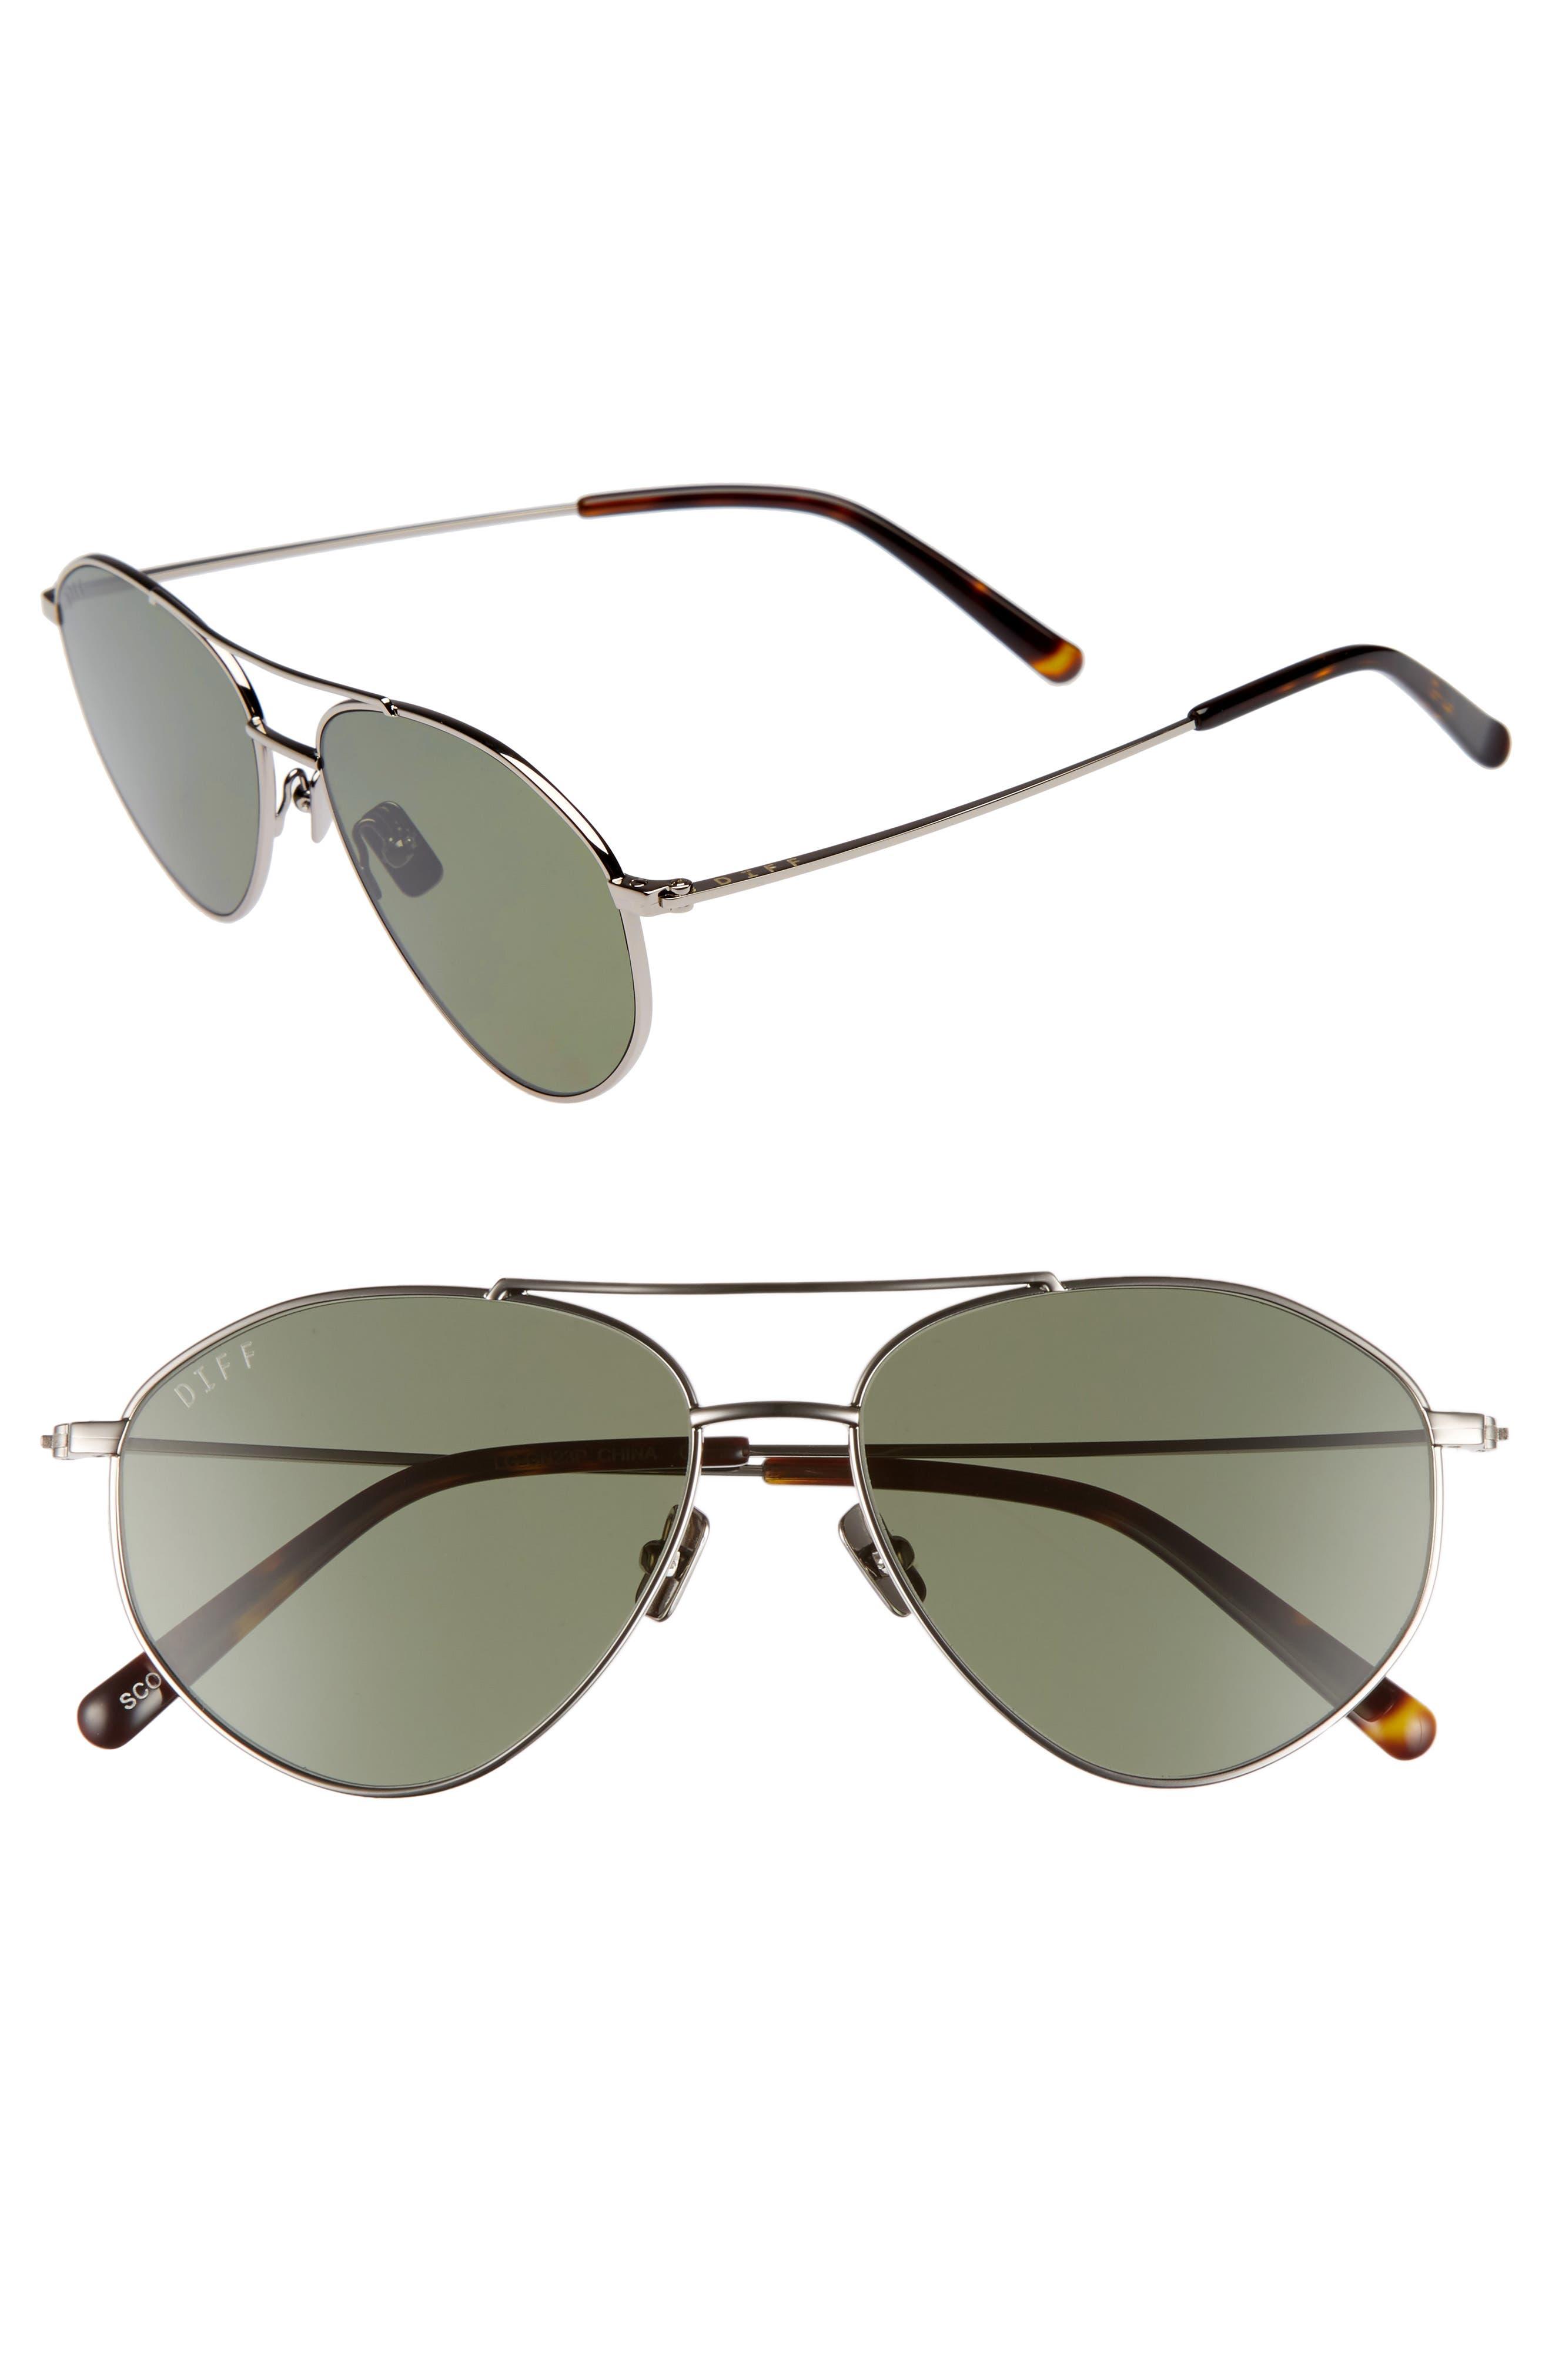 Scout 53mm Aviator Sunglasses,                         Main,                         color, Light Gunmetal/ Green